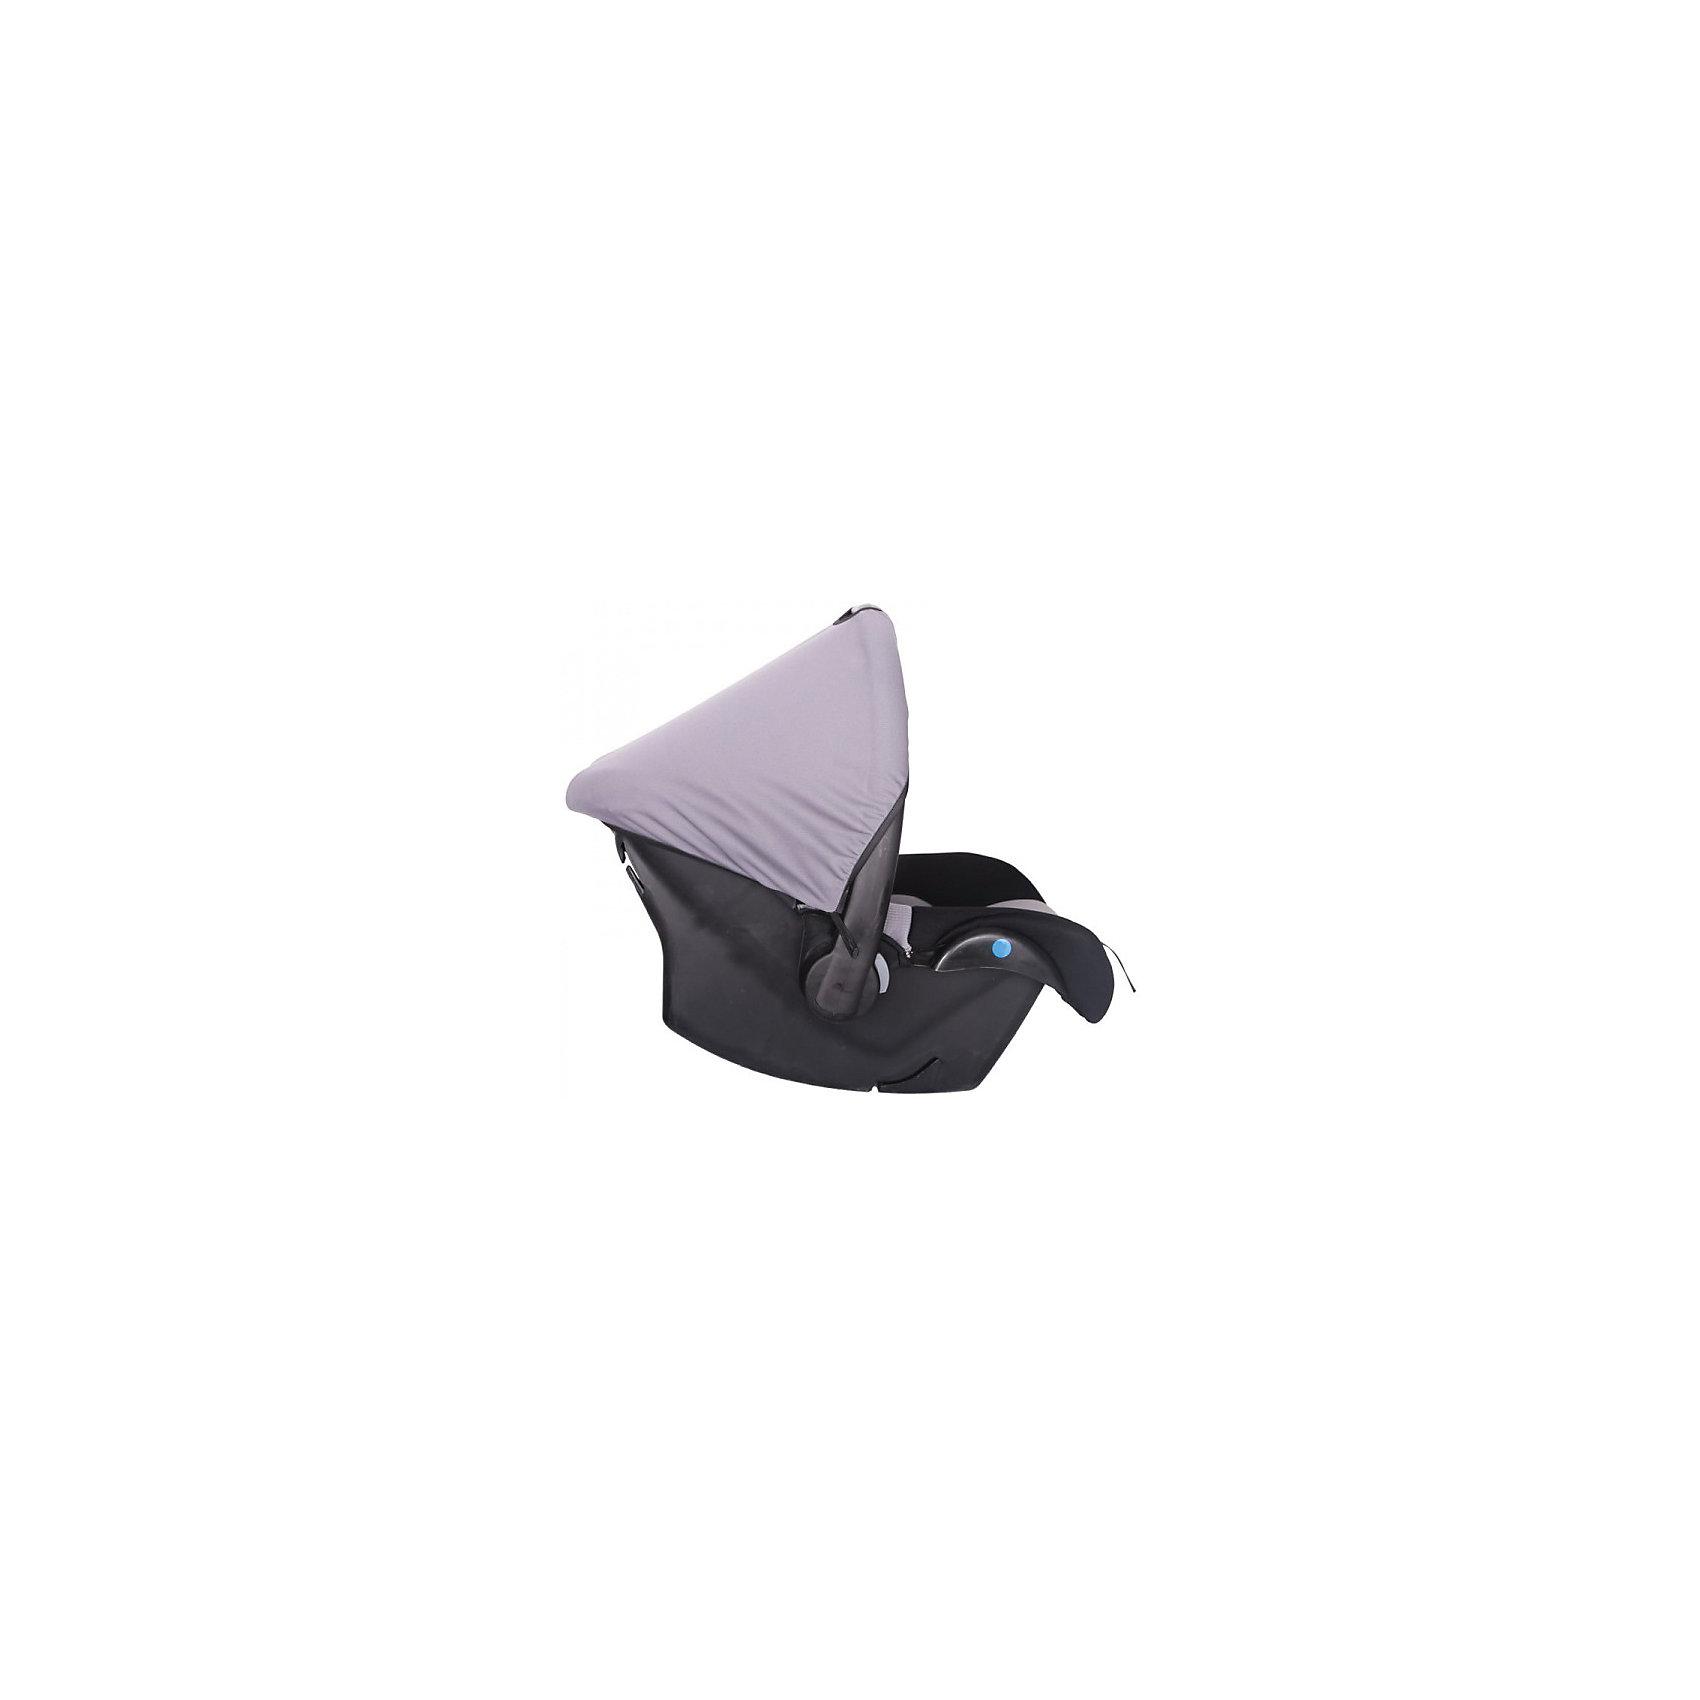 Автокресло Colibri 0-13 кг., Zlatek, серый